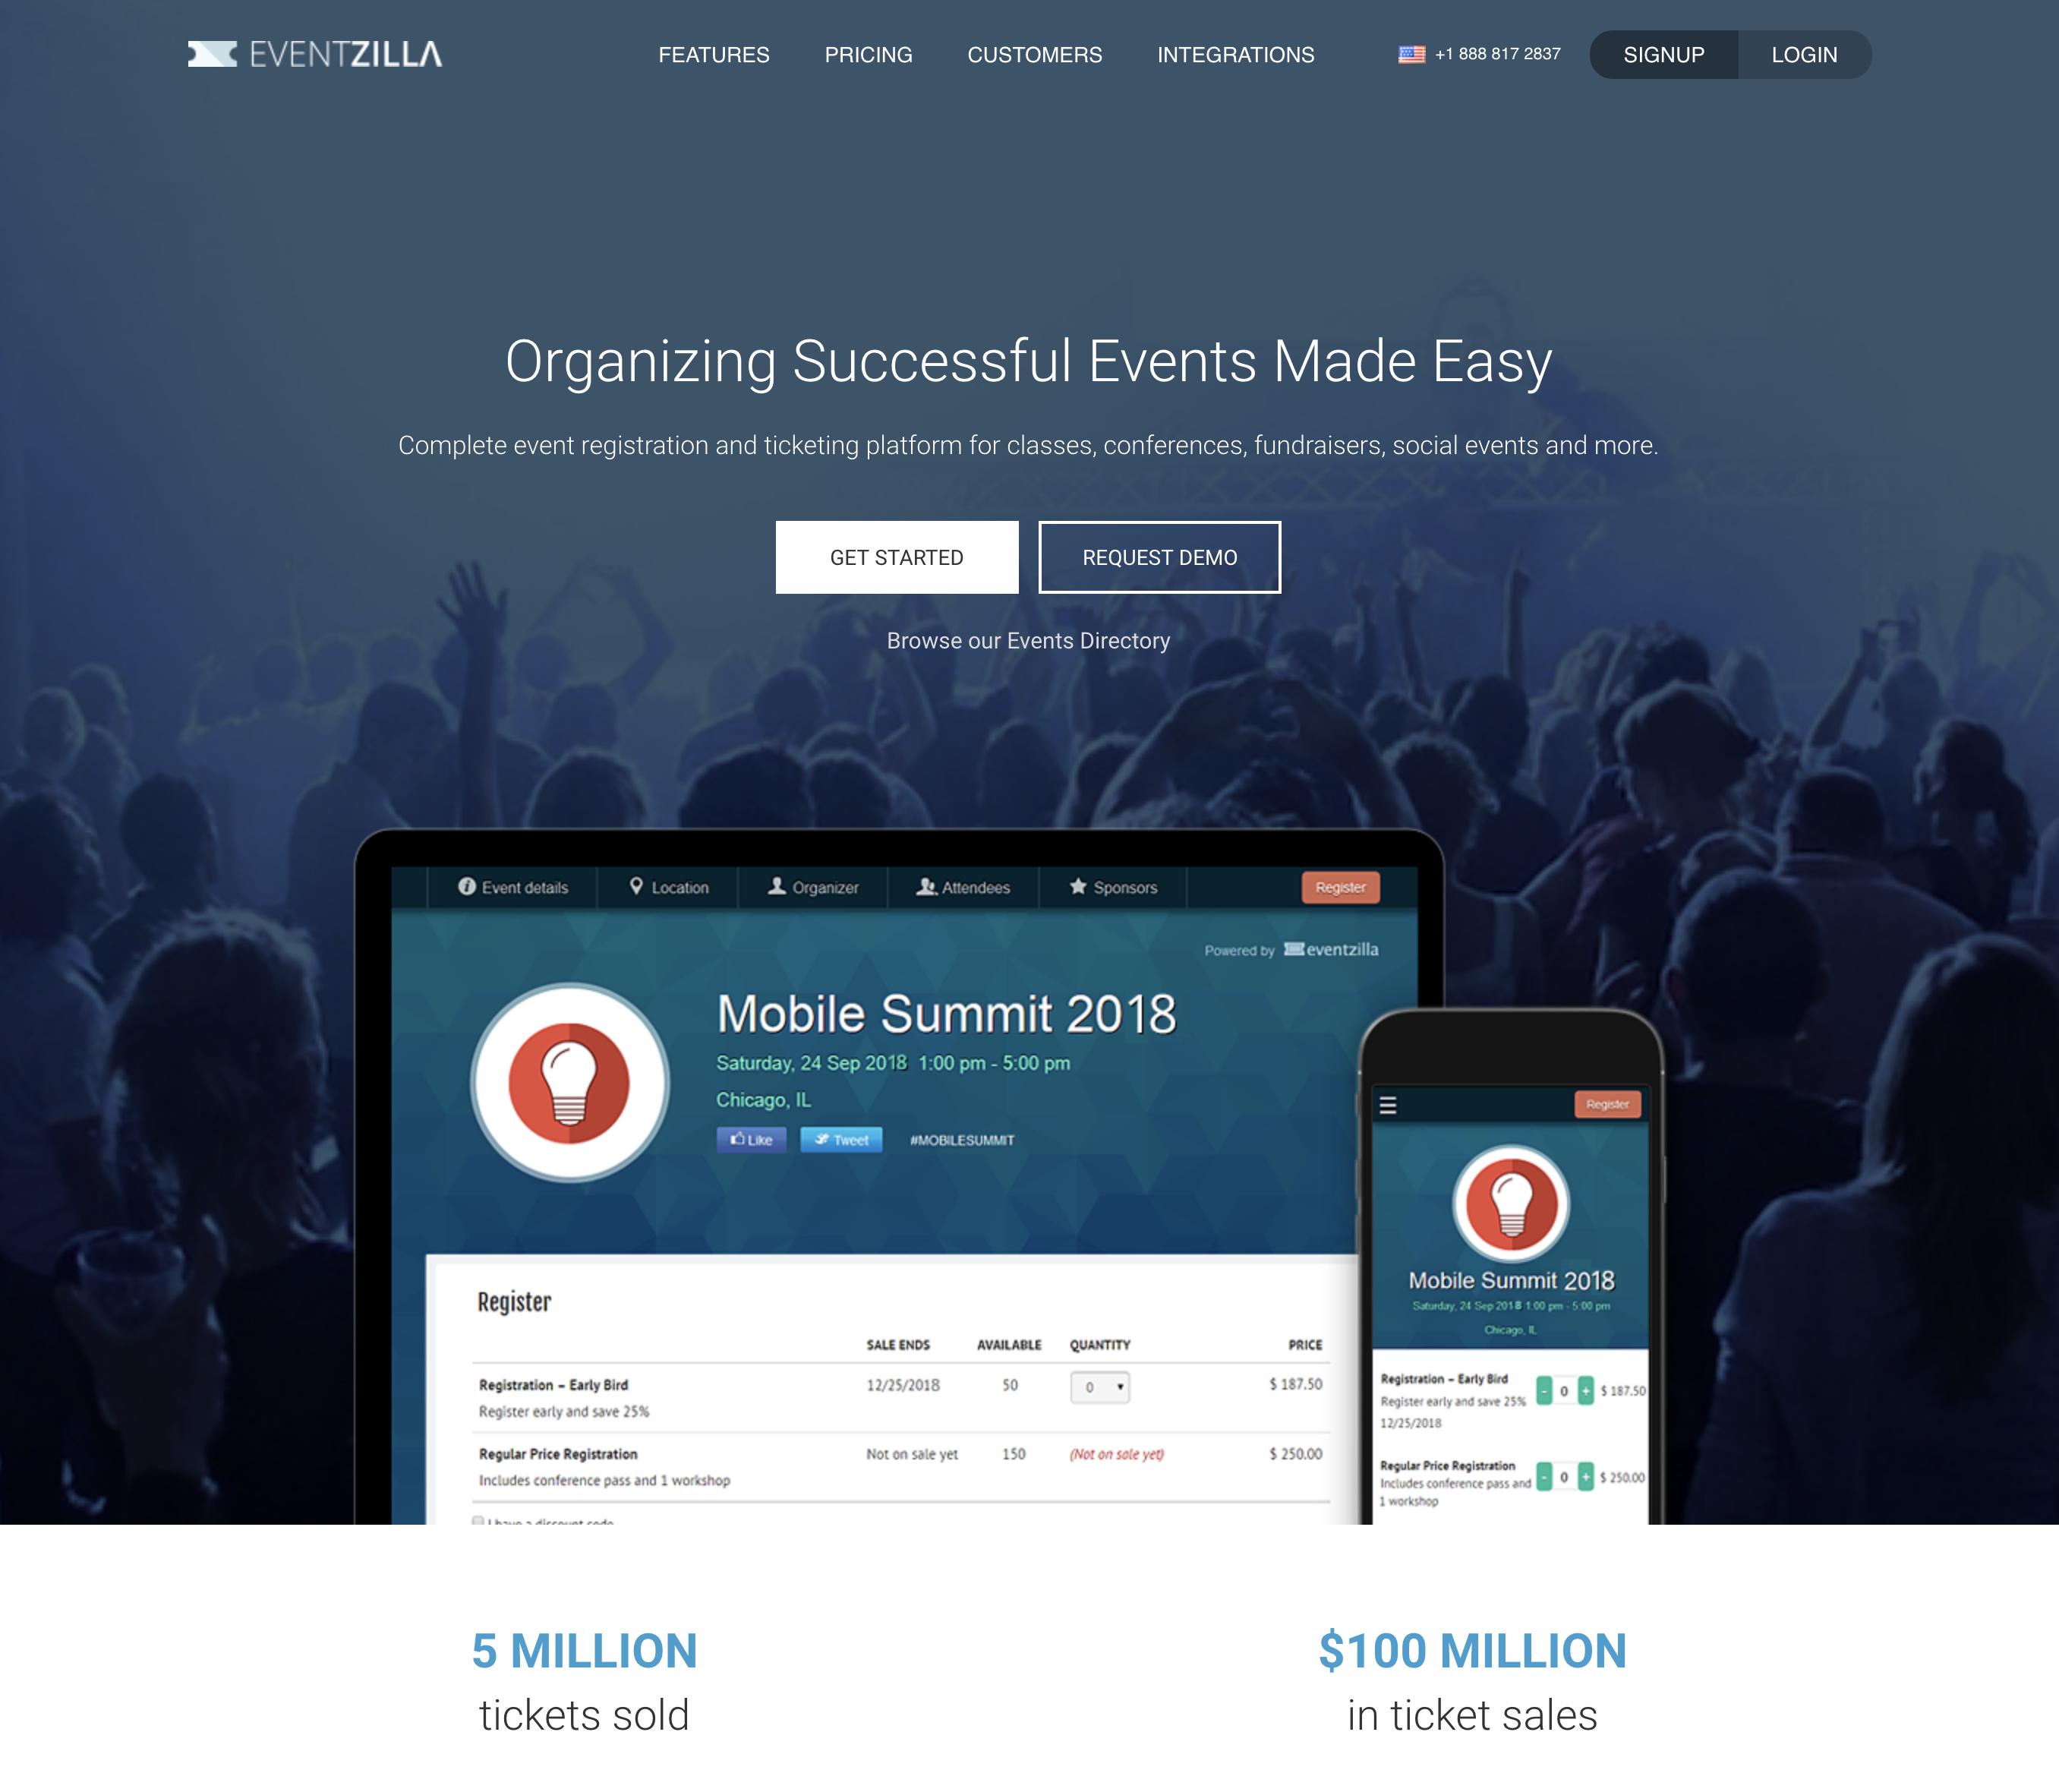 Eventzilla Demo - Event Registrations and Management Platform